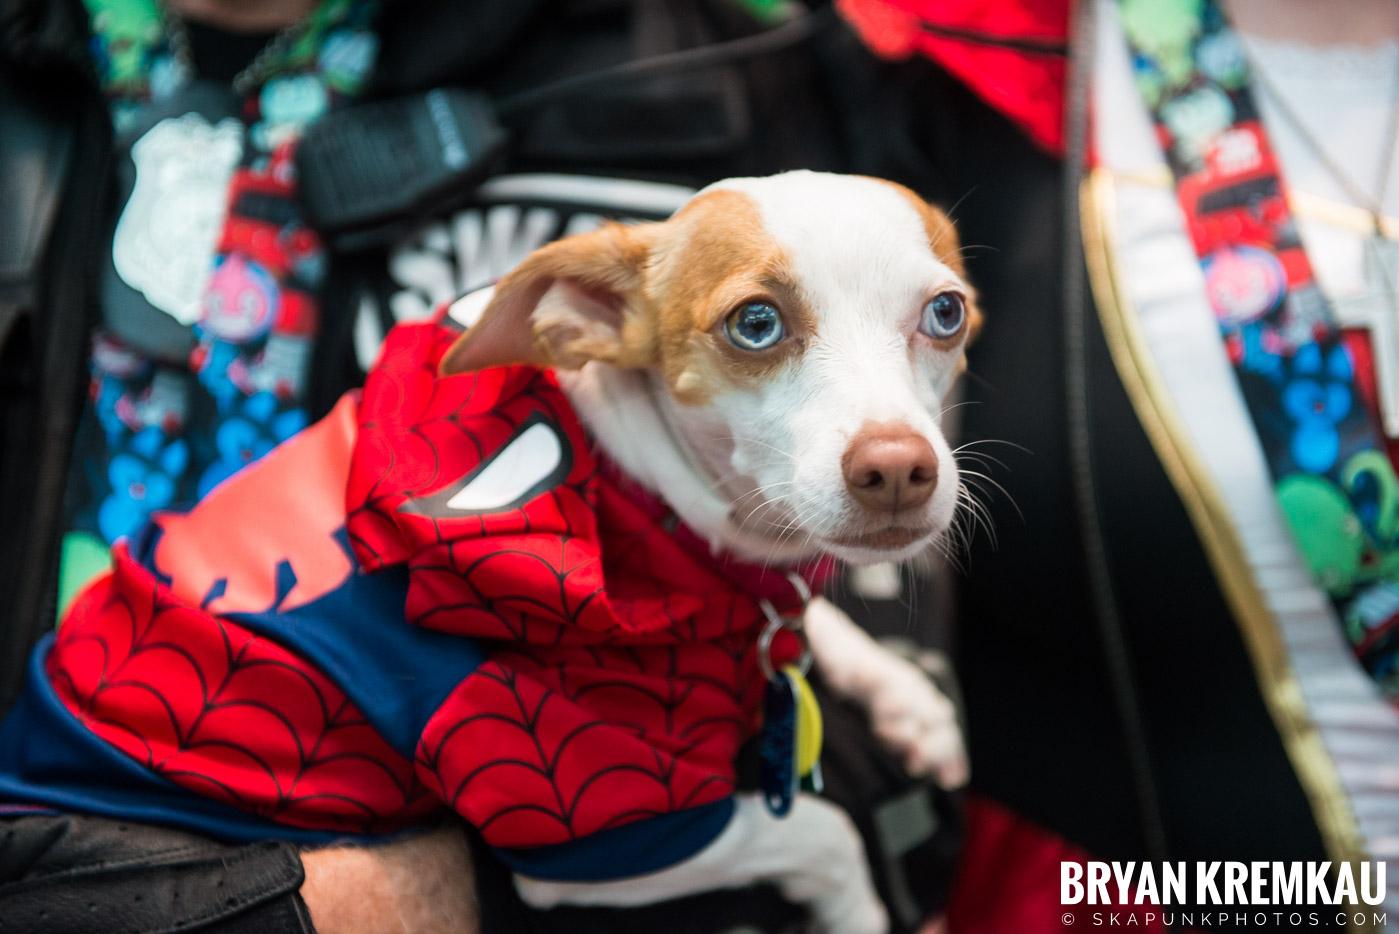 New York Comic Con 2017: Sunday – 10.8.17 (89)